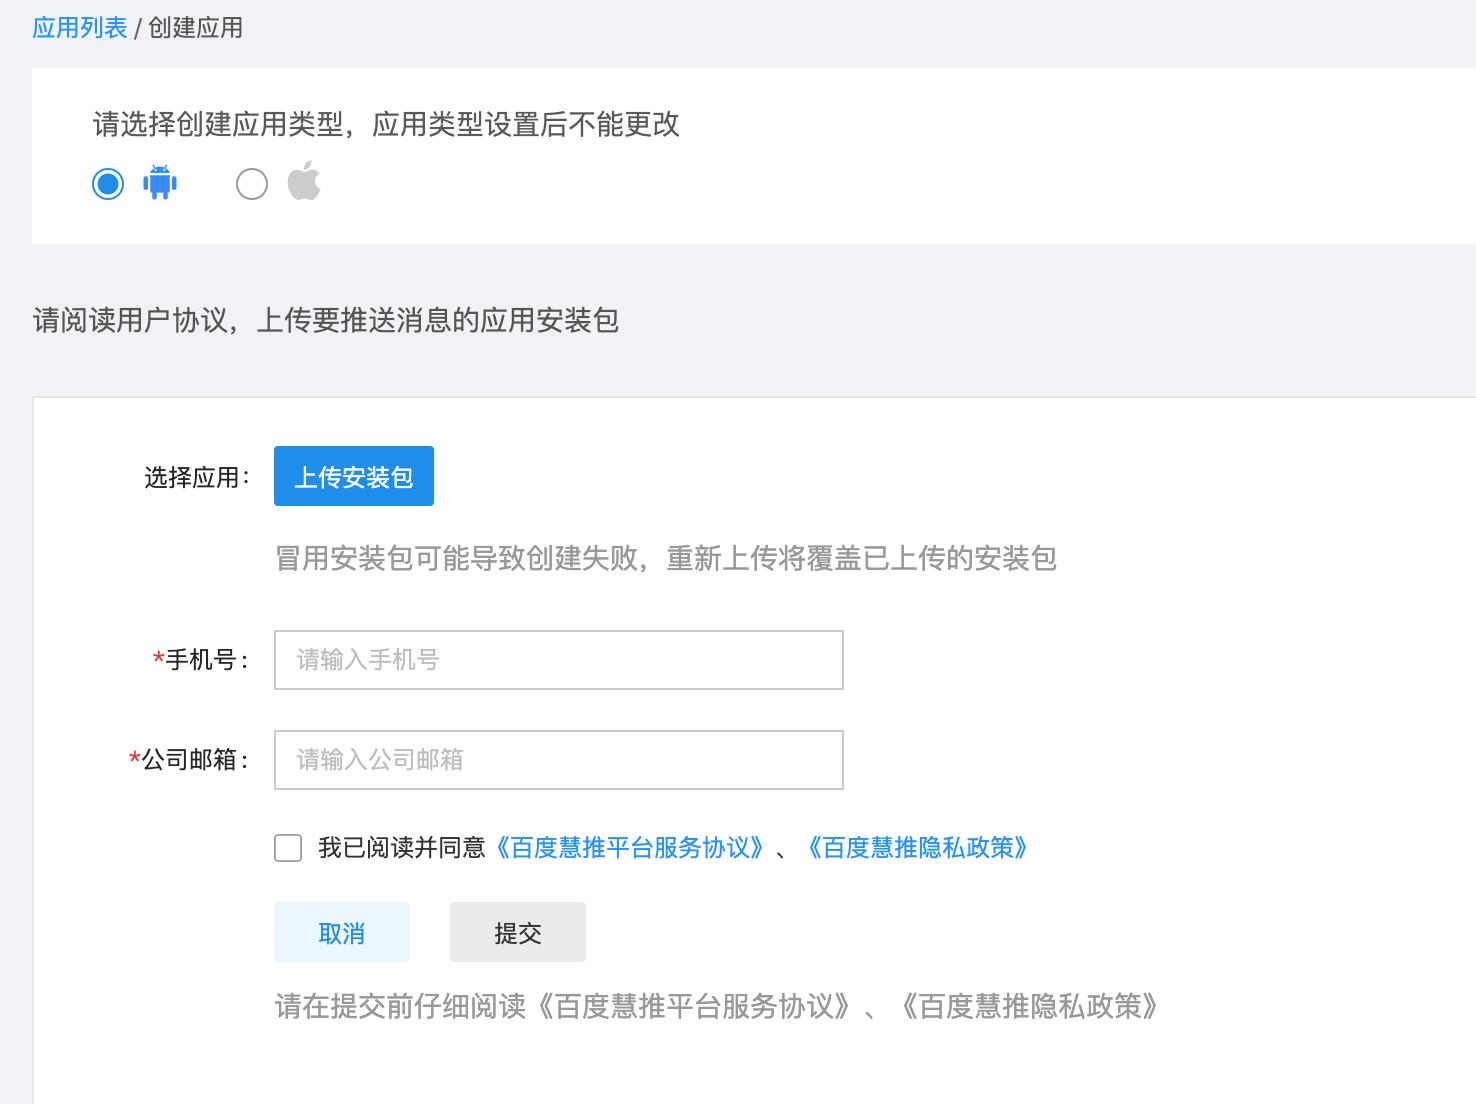 Android推送——百度慧推入门篇